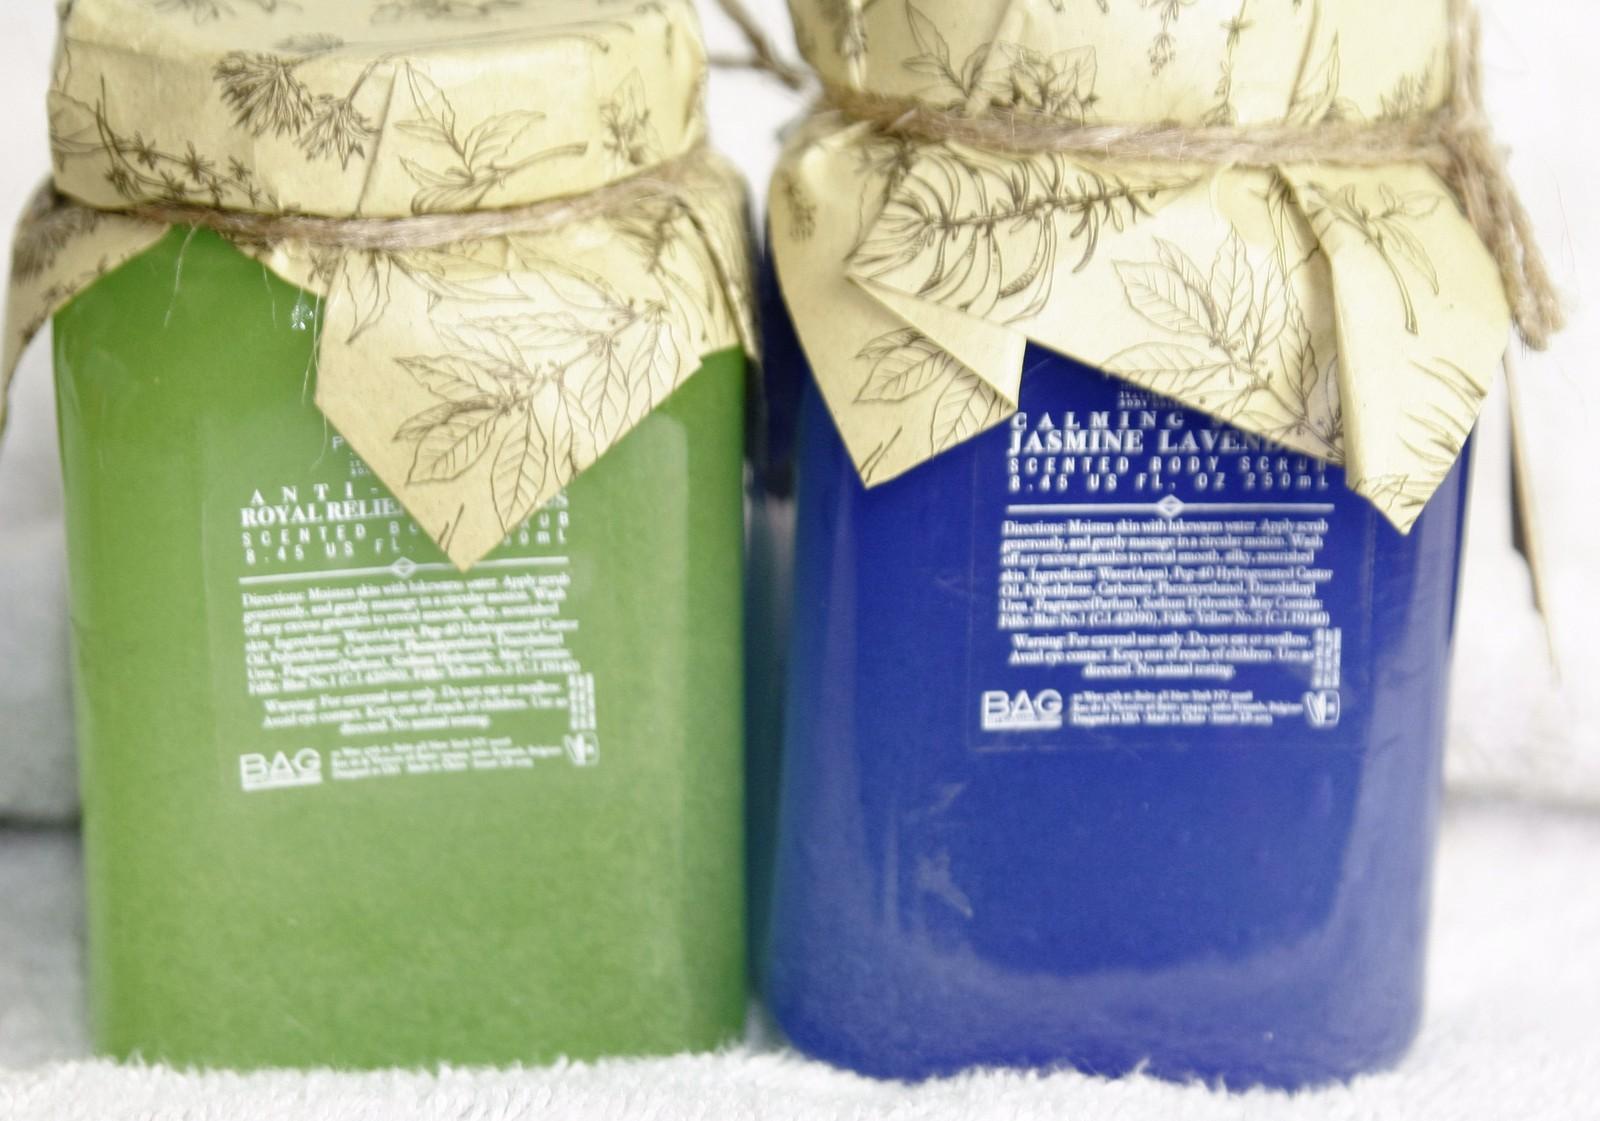 LA BELLA Provincia Aromatherapy Body Scrub Eucalyptus OR  Jasmine Lavender